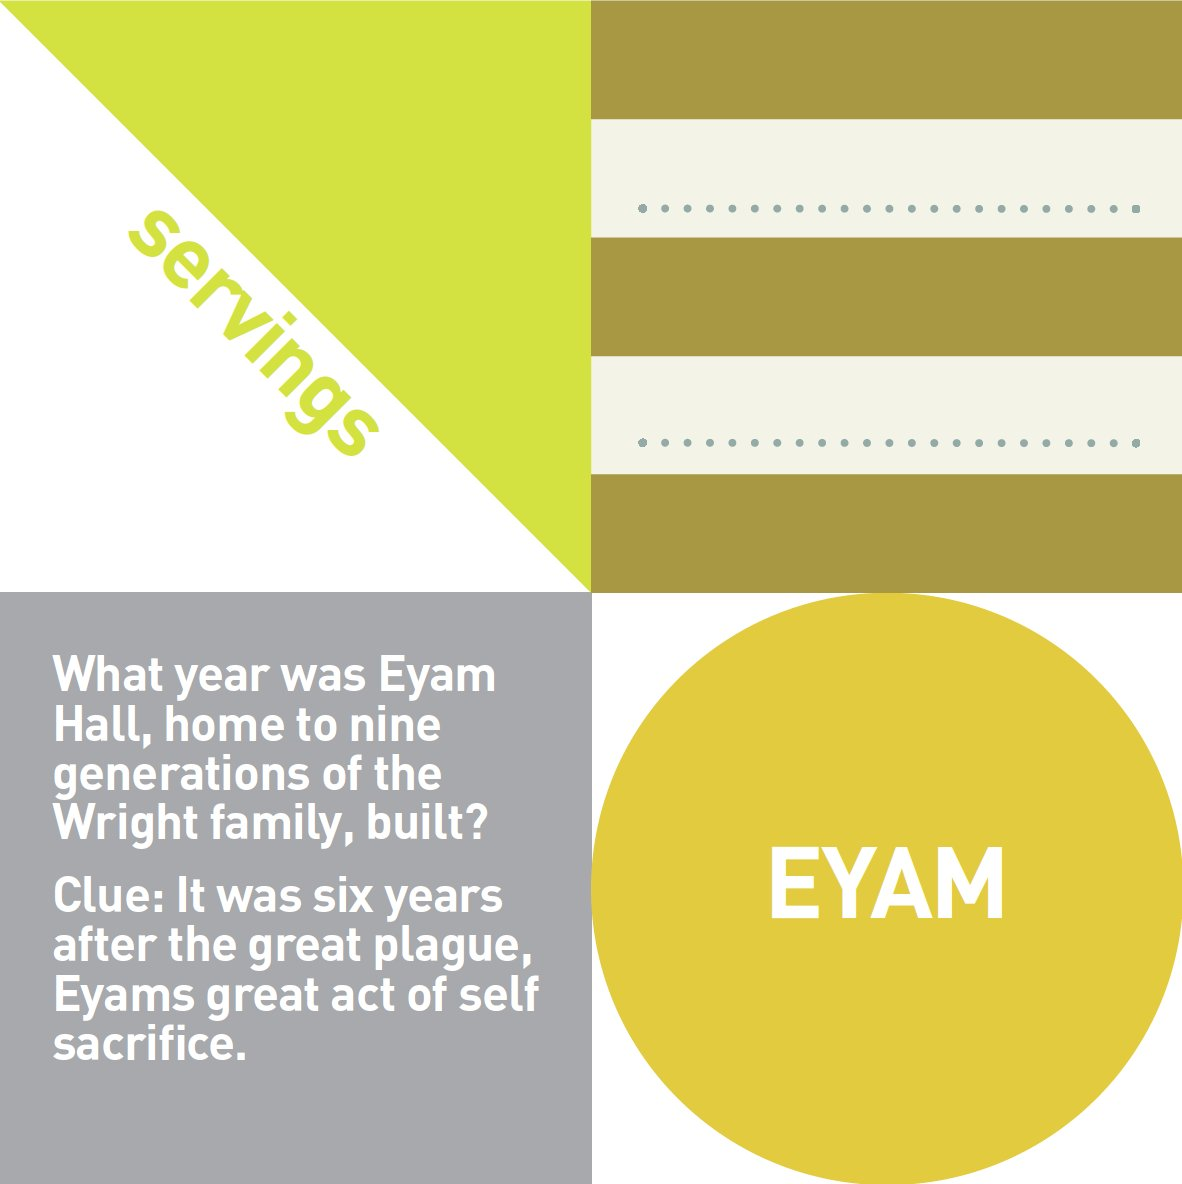 Day 12 - Clue #12 of the #PeakDistrict #TreasureHunt   #eyam #plaguevillage #peak #eyamhall #eyamhallcraftcentre #eyammuseum #café http://www.peakdistrictdesign.co.uk